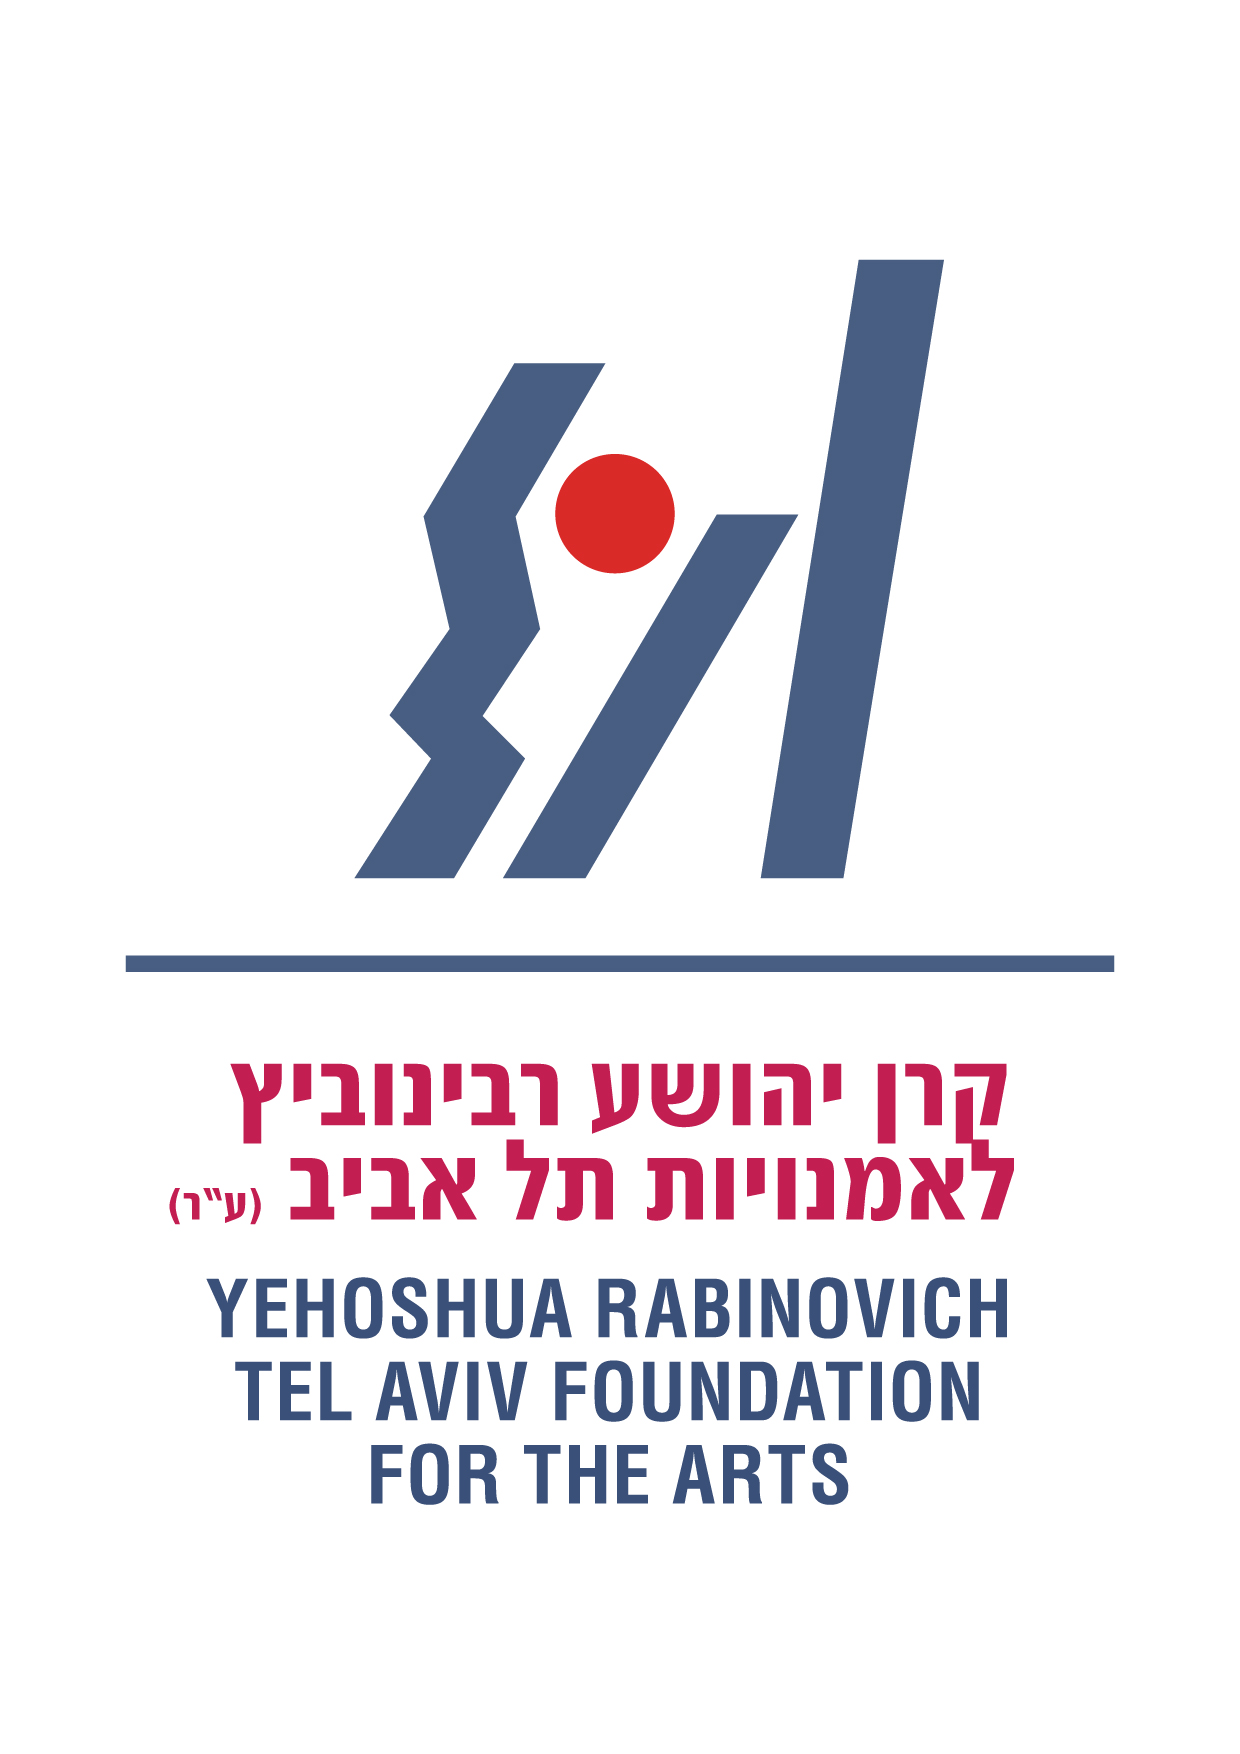 rabinovitch-logo-02.jpg